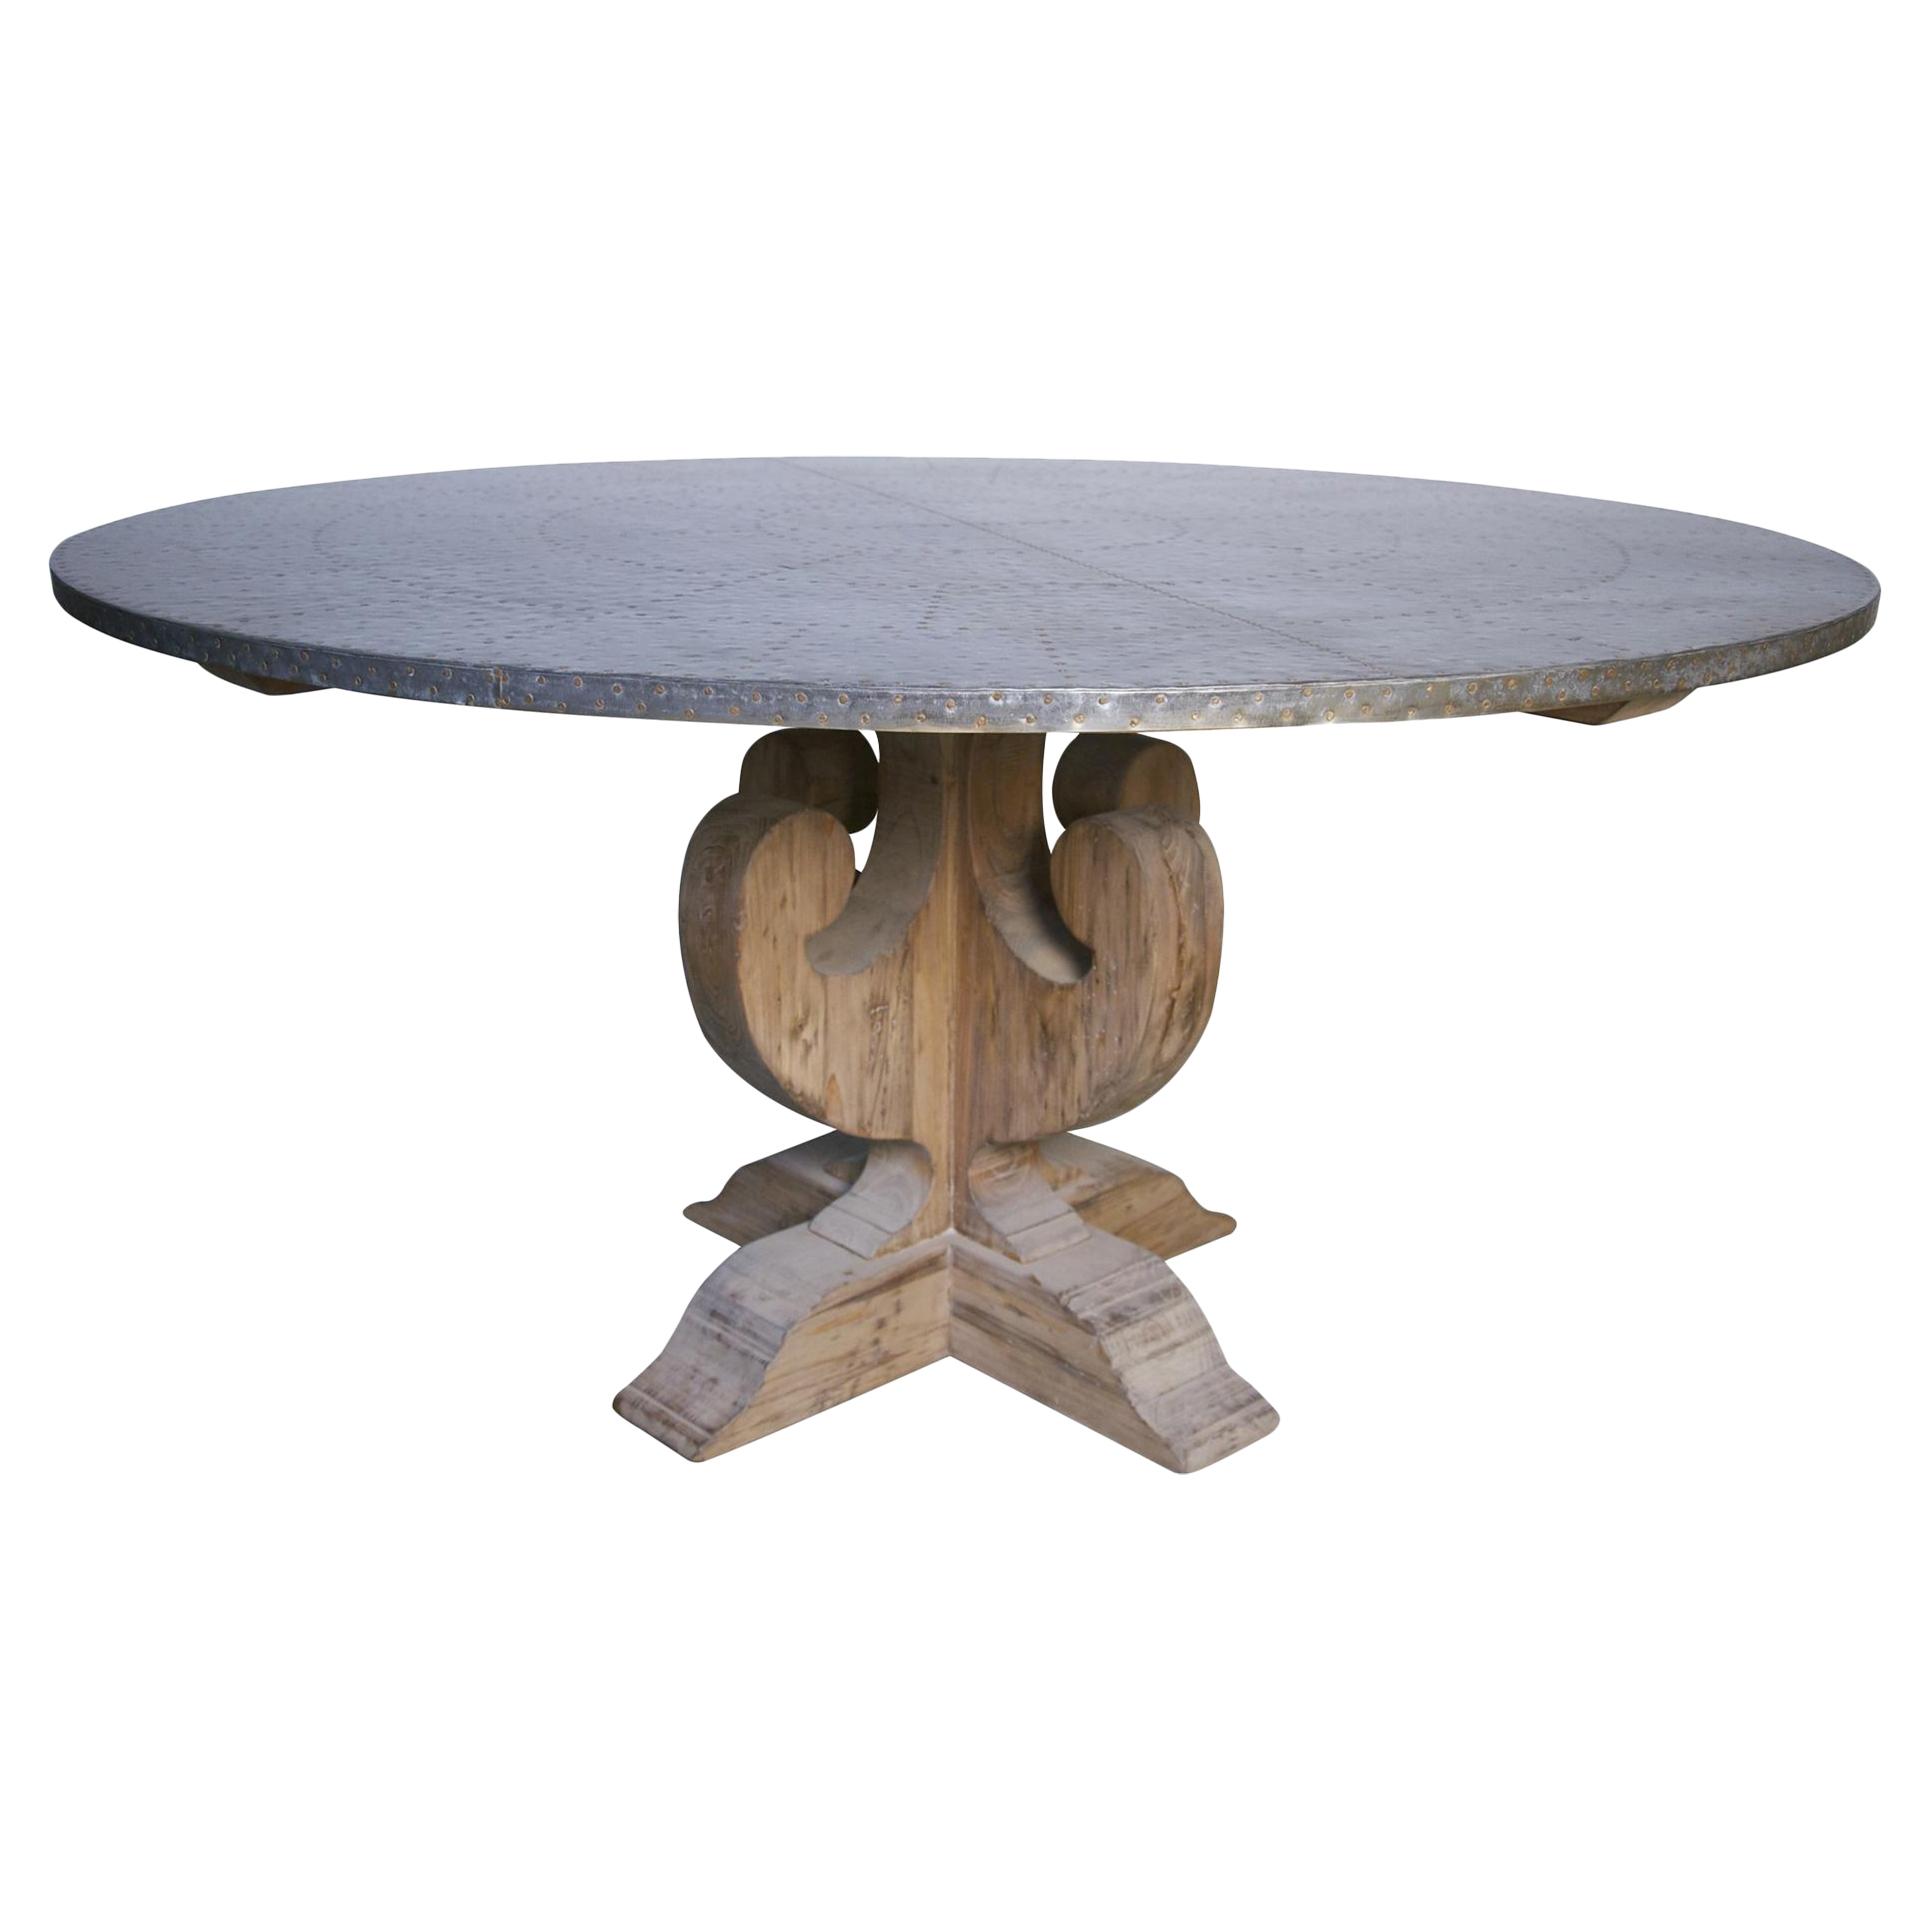 Walker Industrial Loft Zinc Top Wood Base Round Dining Table